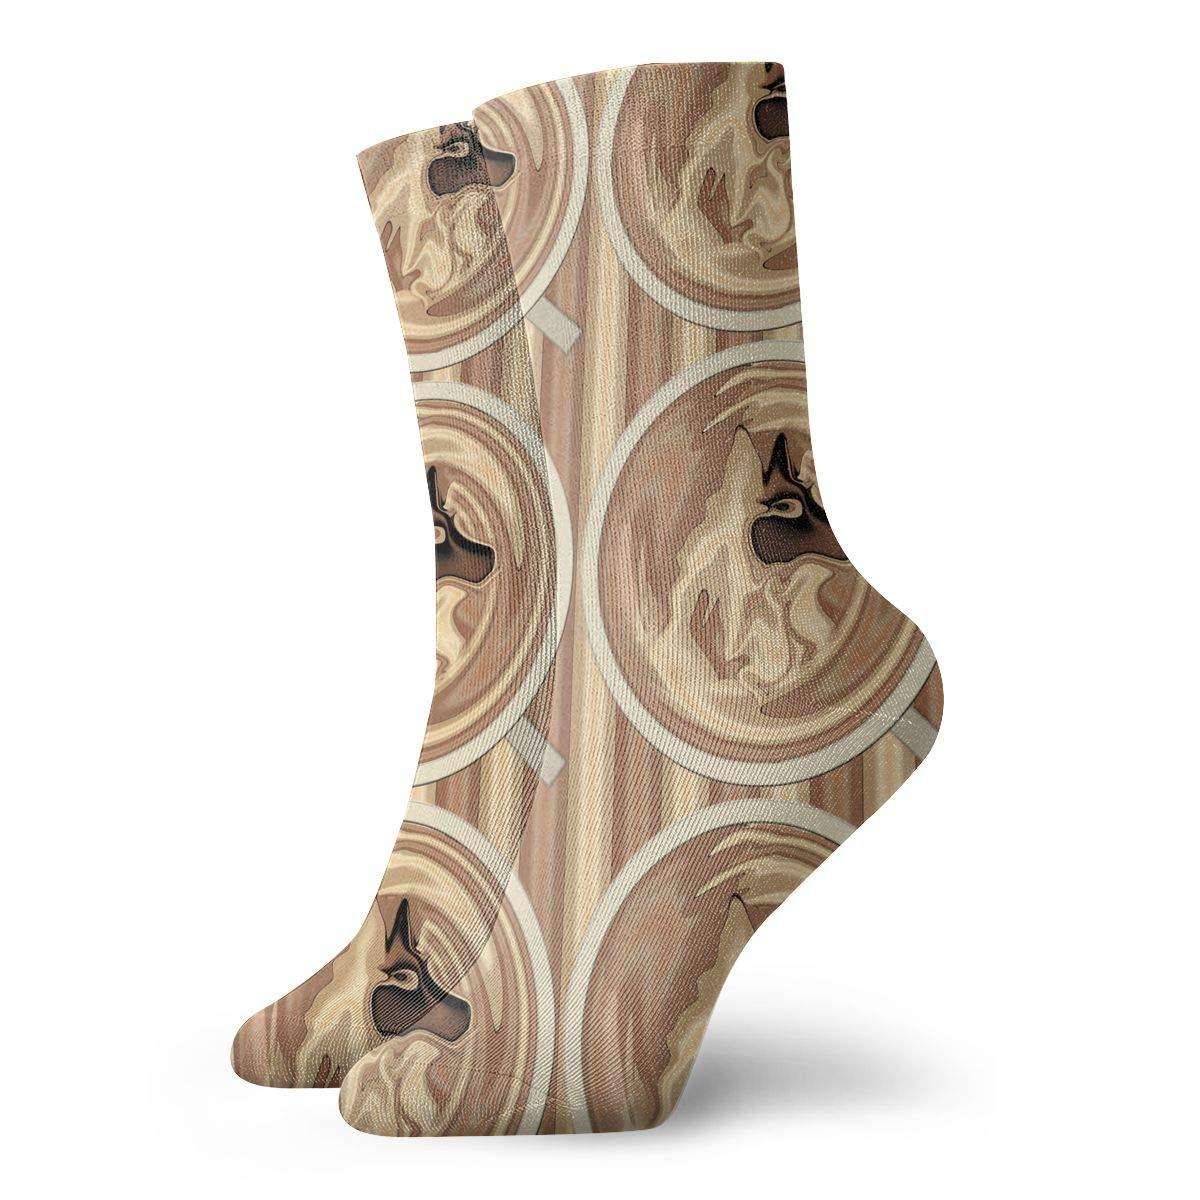 Latte Wolf Half Drop Fashion Dress Socks Short Socks Leisure Travel 11.8 Inch